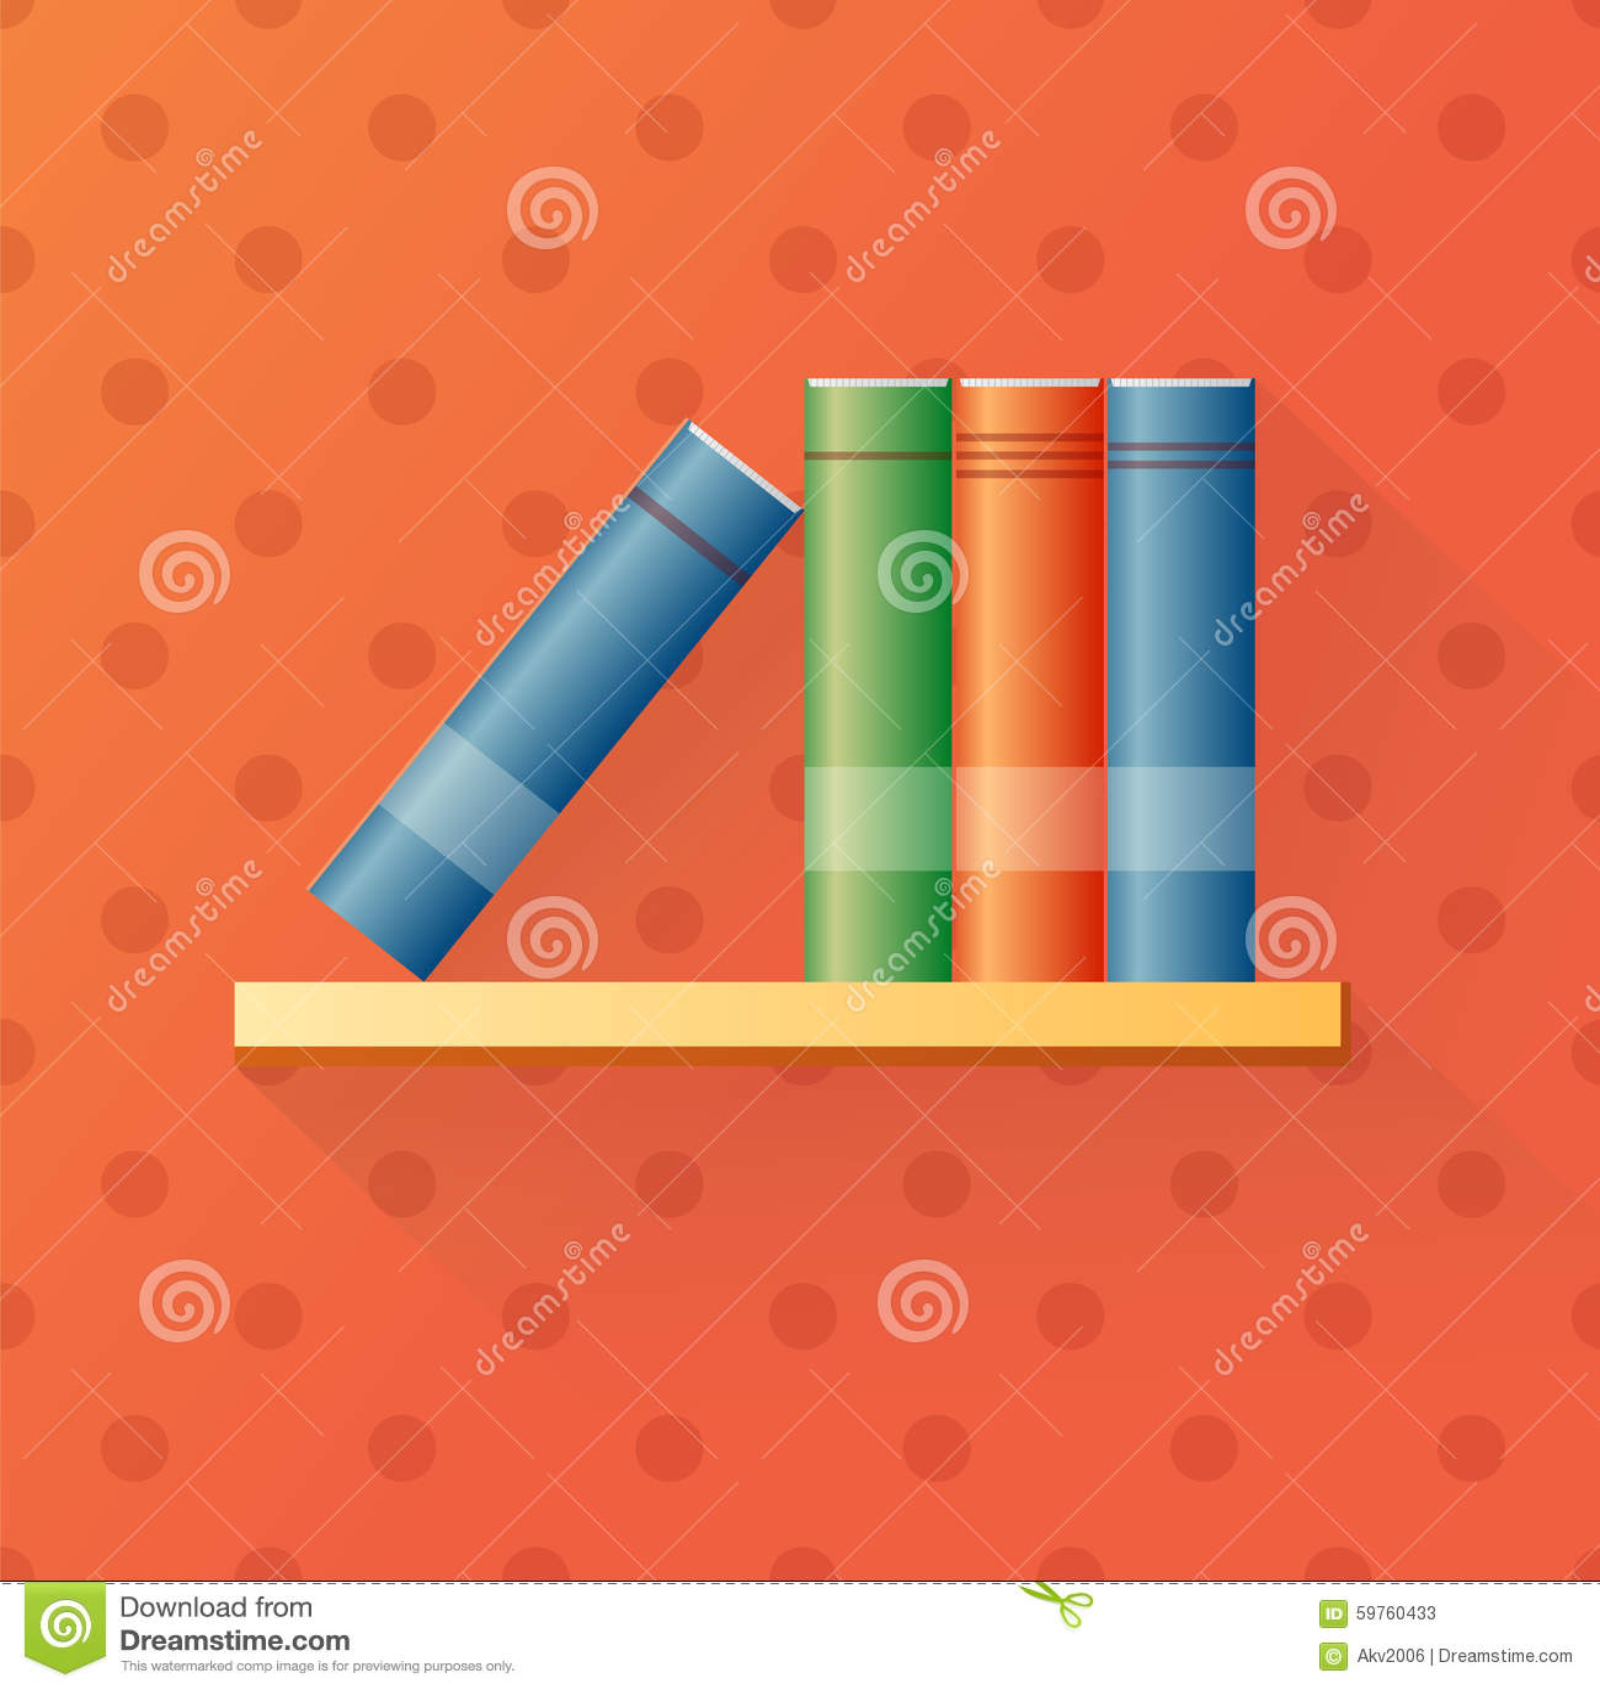 Bookshelf Cartoon Stock Vector Illustration Of Library